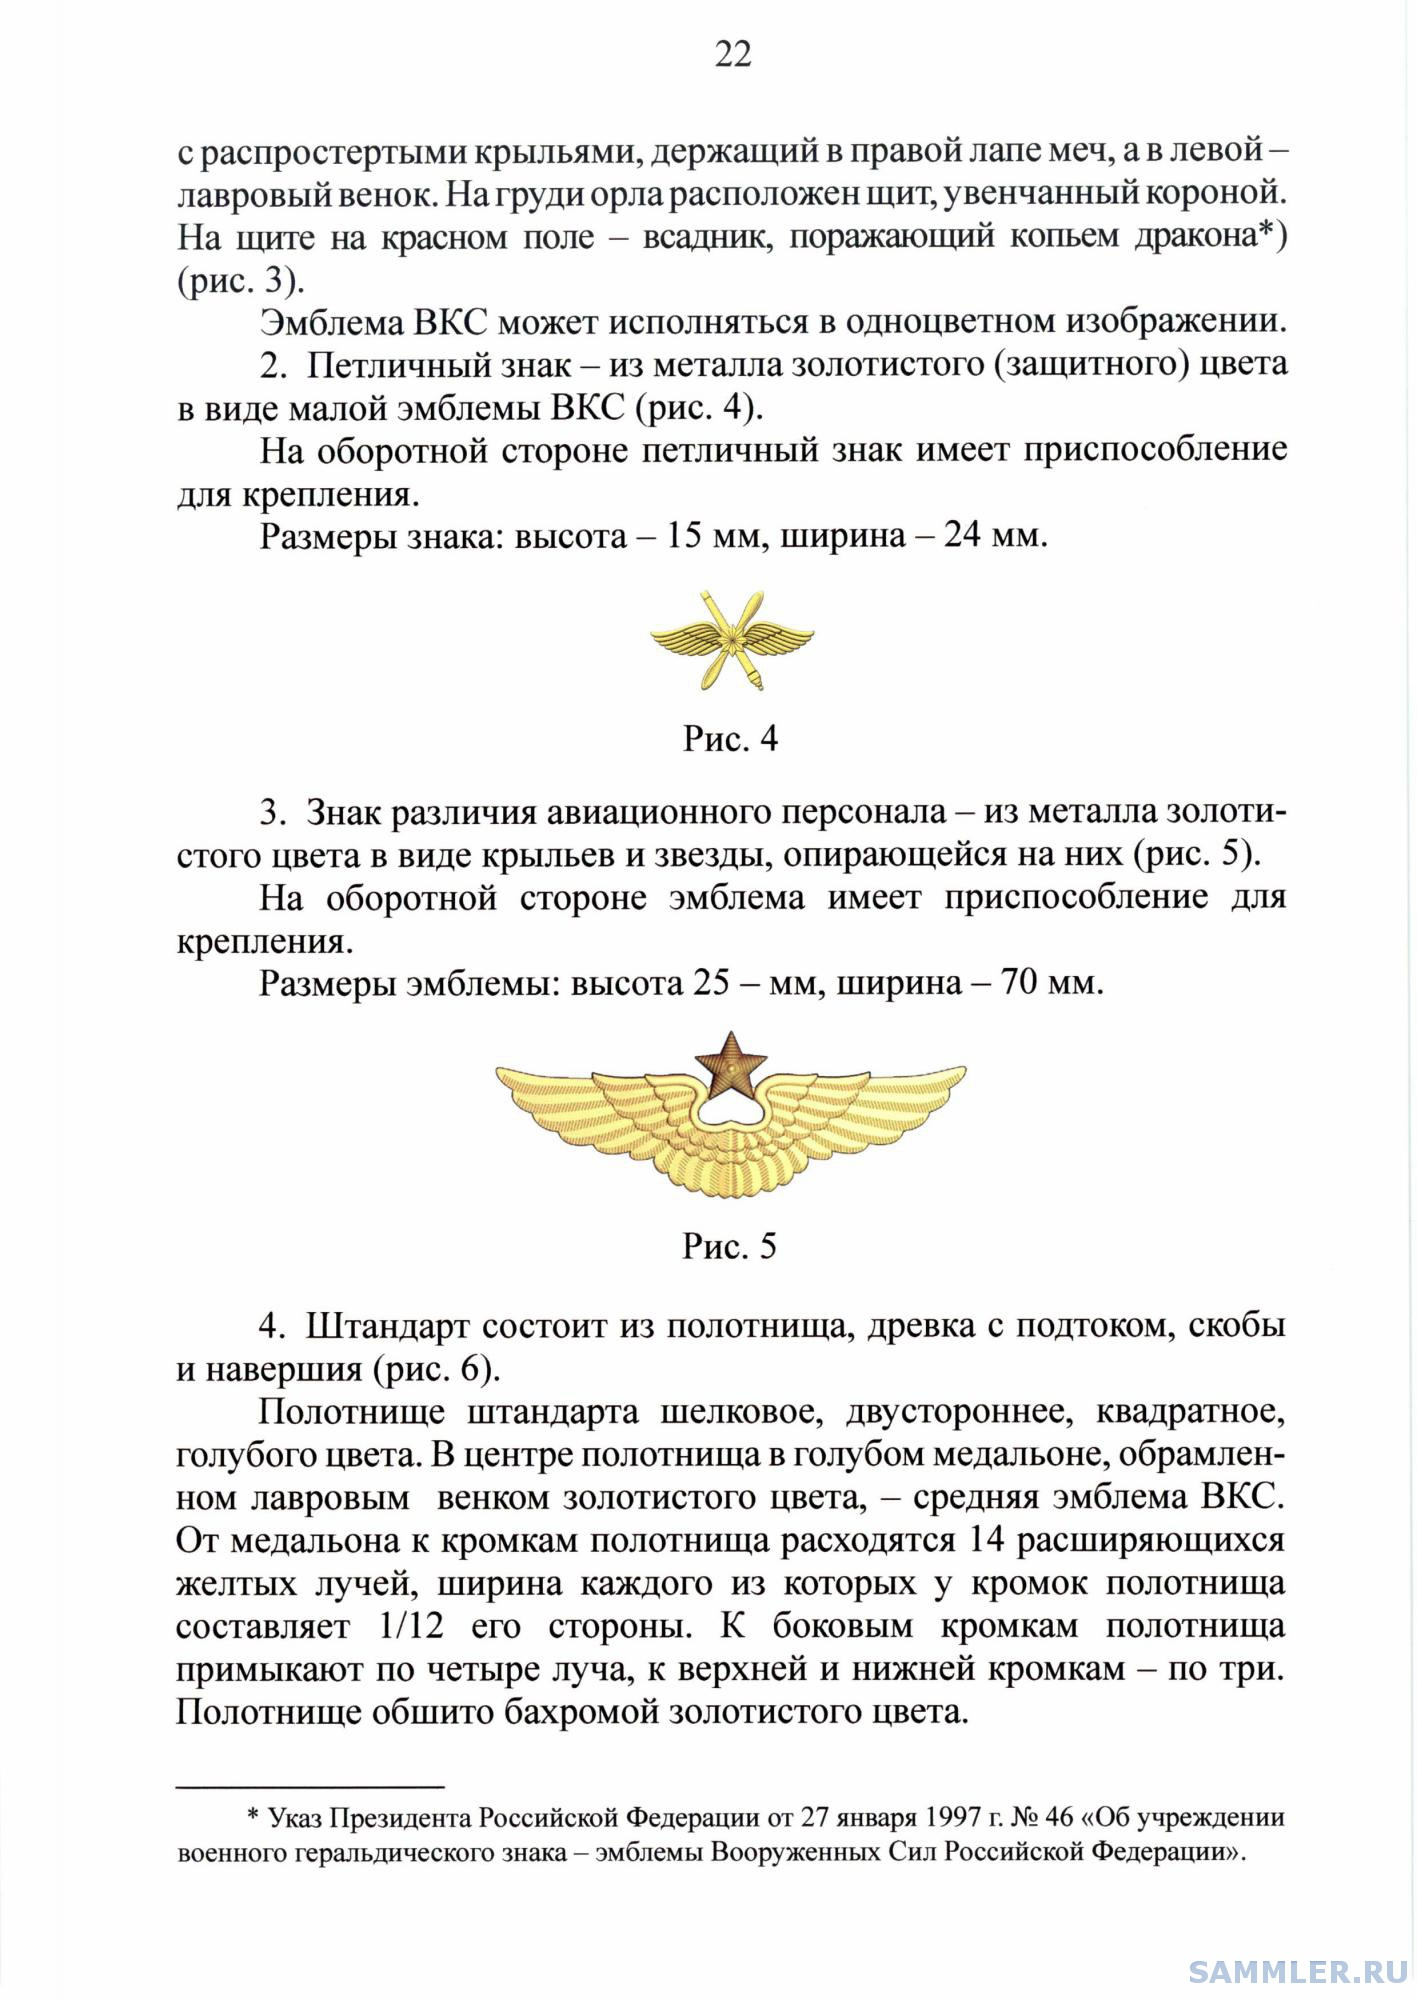 МО РФ 470(цвет)-22.jpg